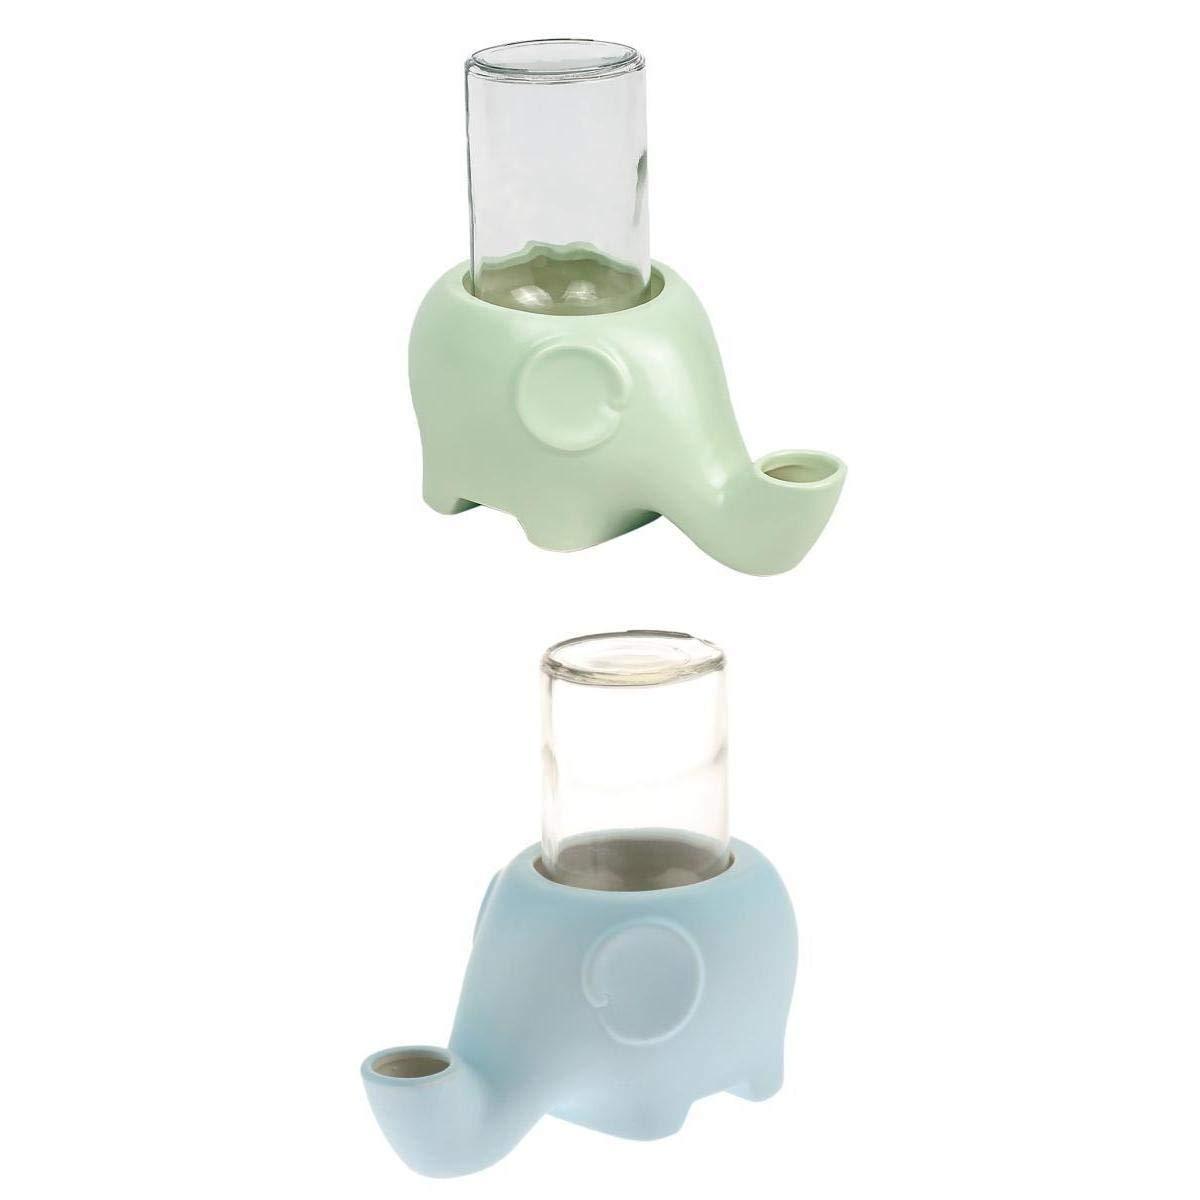 joyMerit 2 x Ceramic Antiskid Design Elephant Shape Pet Water Feeders Drinking Bottle, Portable Dog Cats Wall Hanging Feeder Portable Pet Supplies by joyMerit